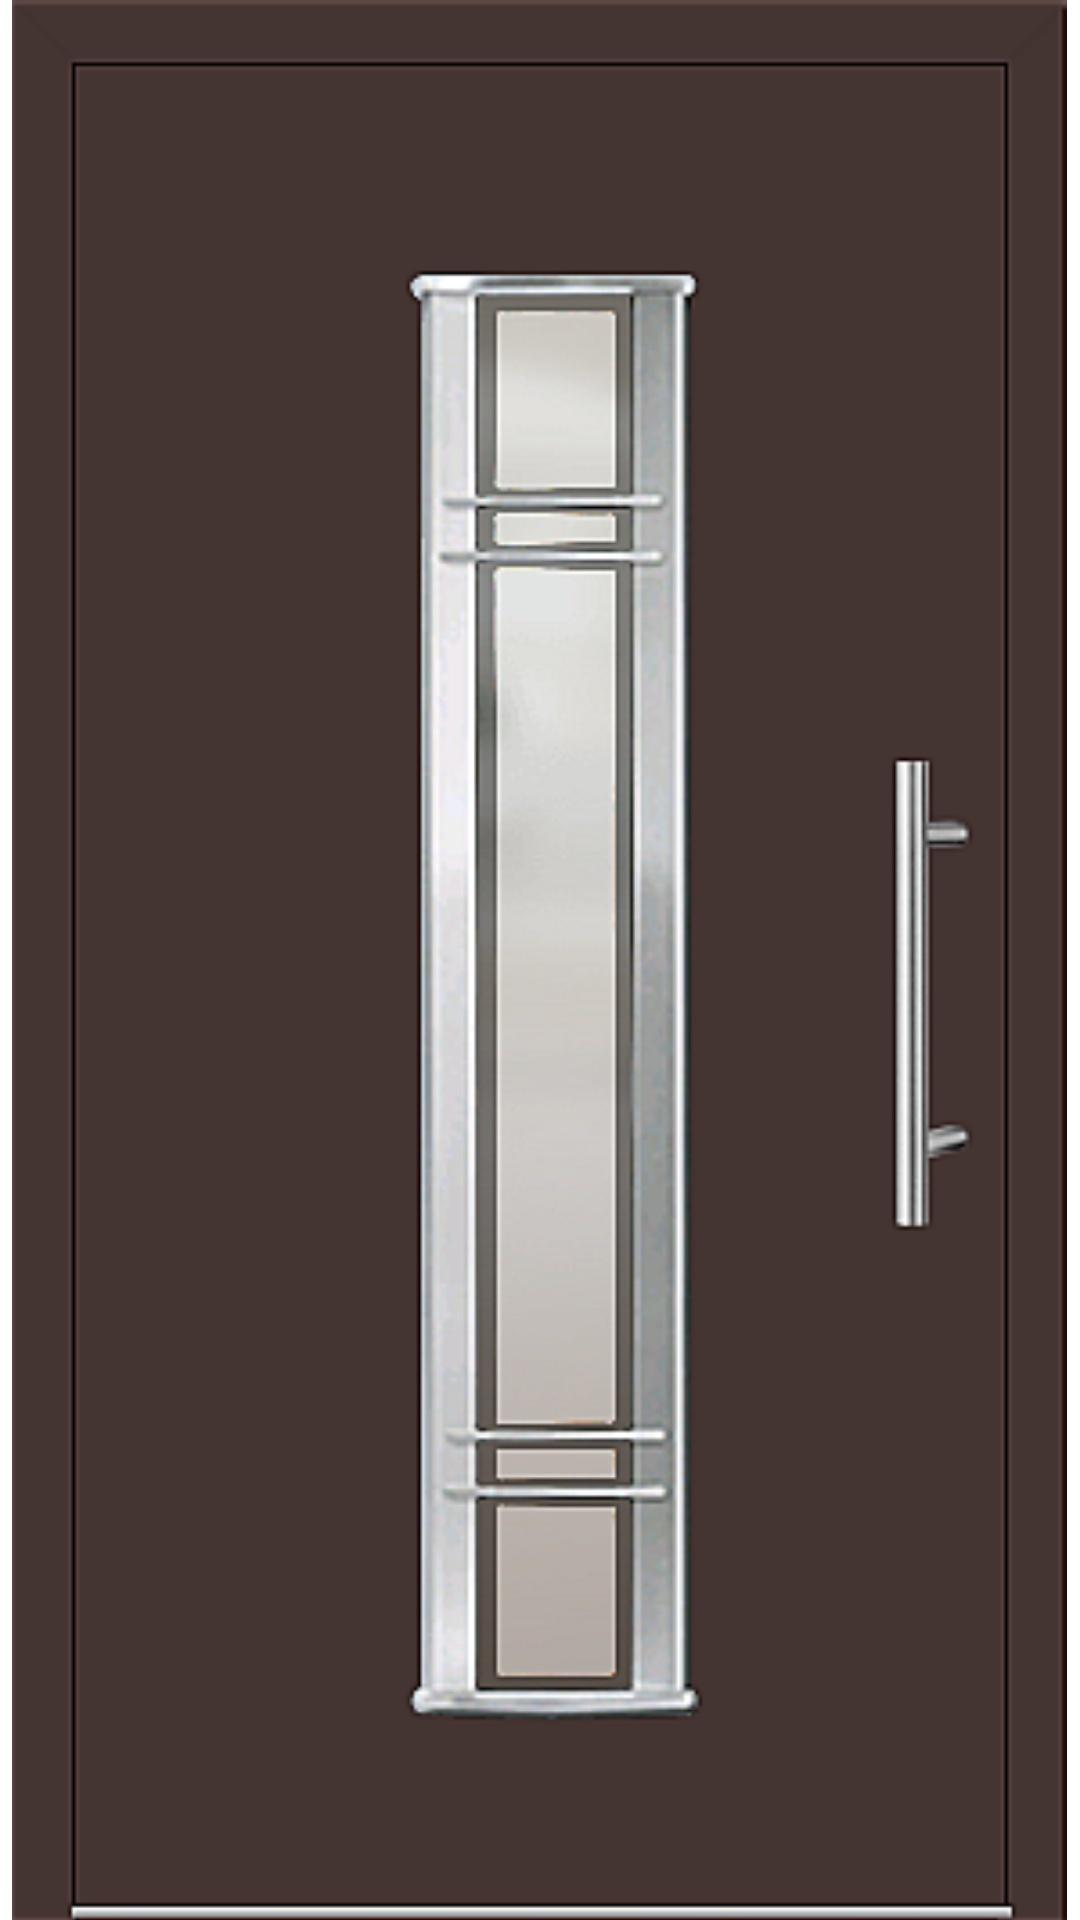 Kunststoff Haustür Modell 6962-79 mahagonibraun